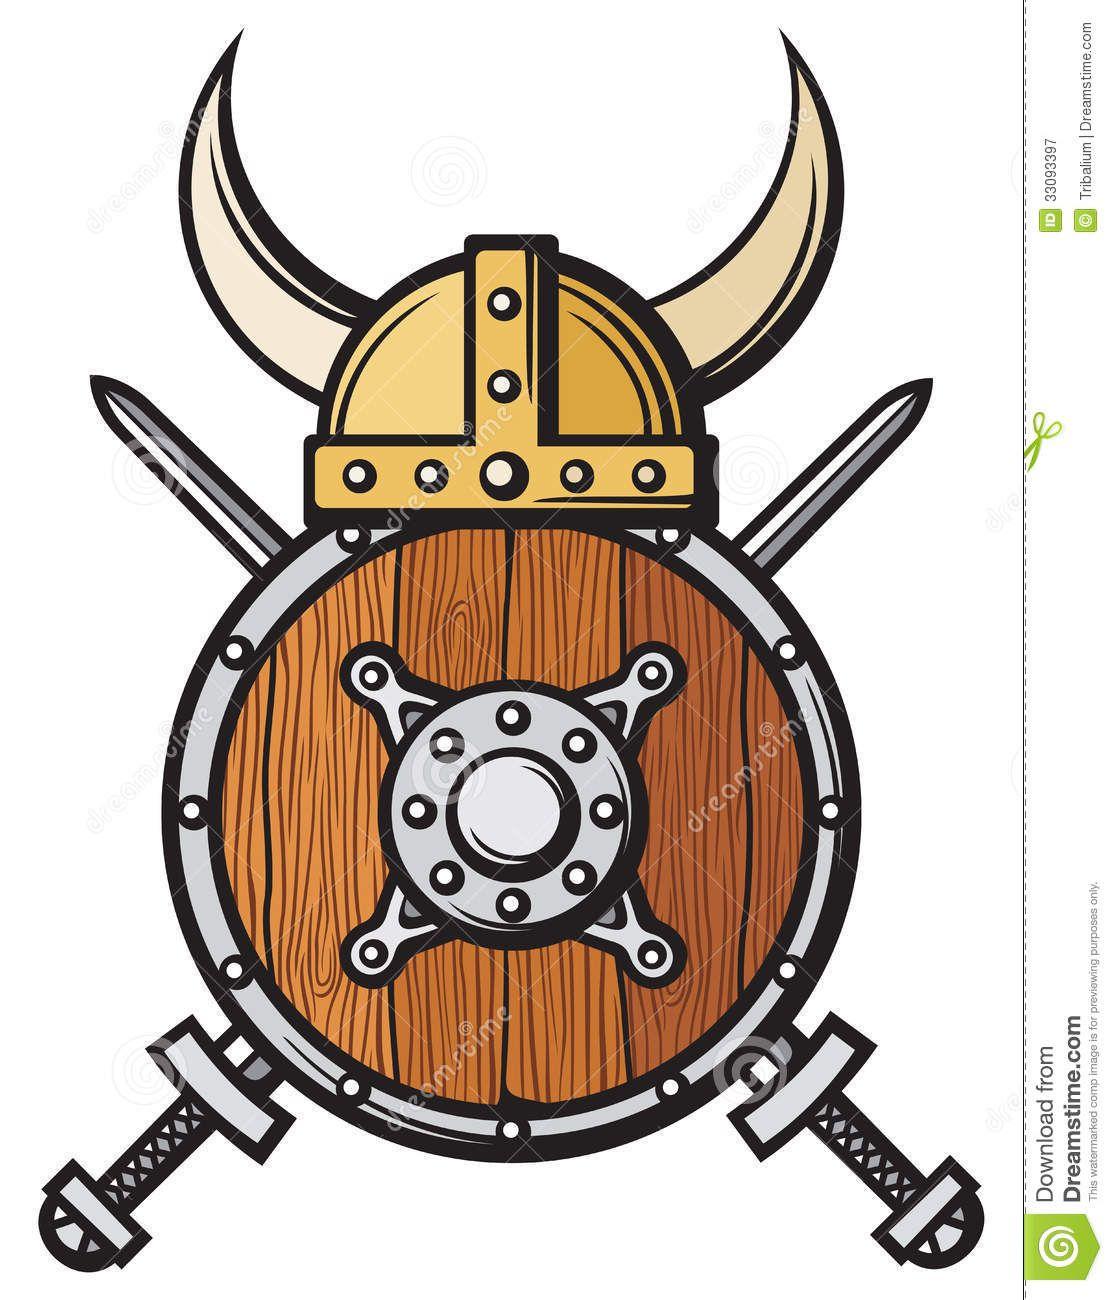 hight resolution of viking helmet royalty free stock photography image 33093397